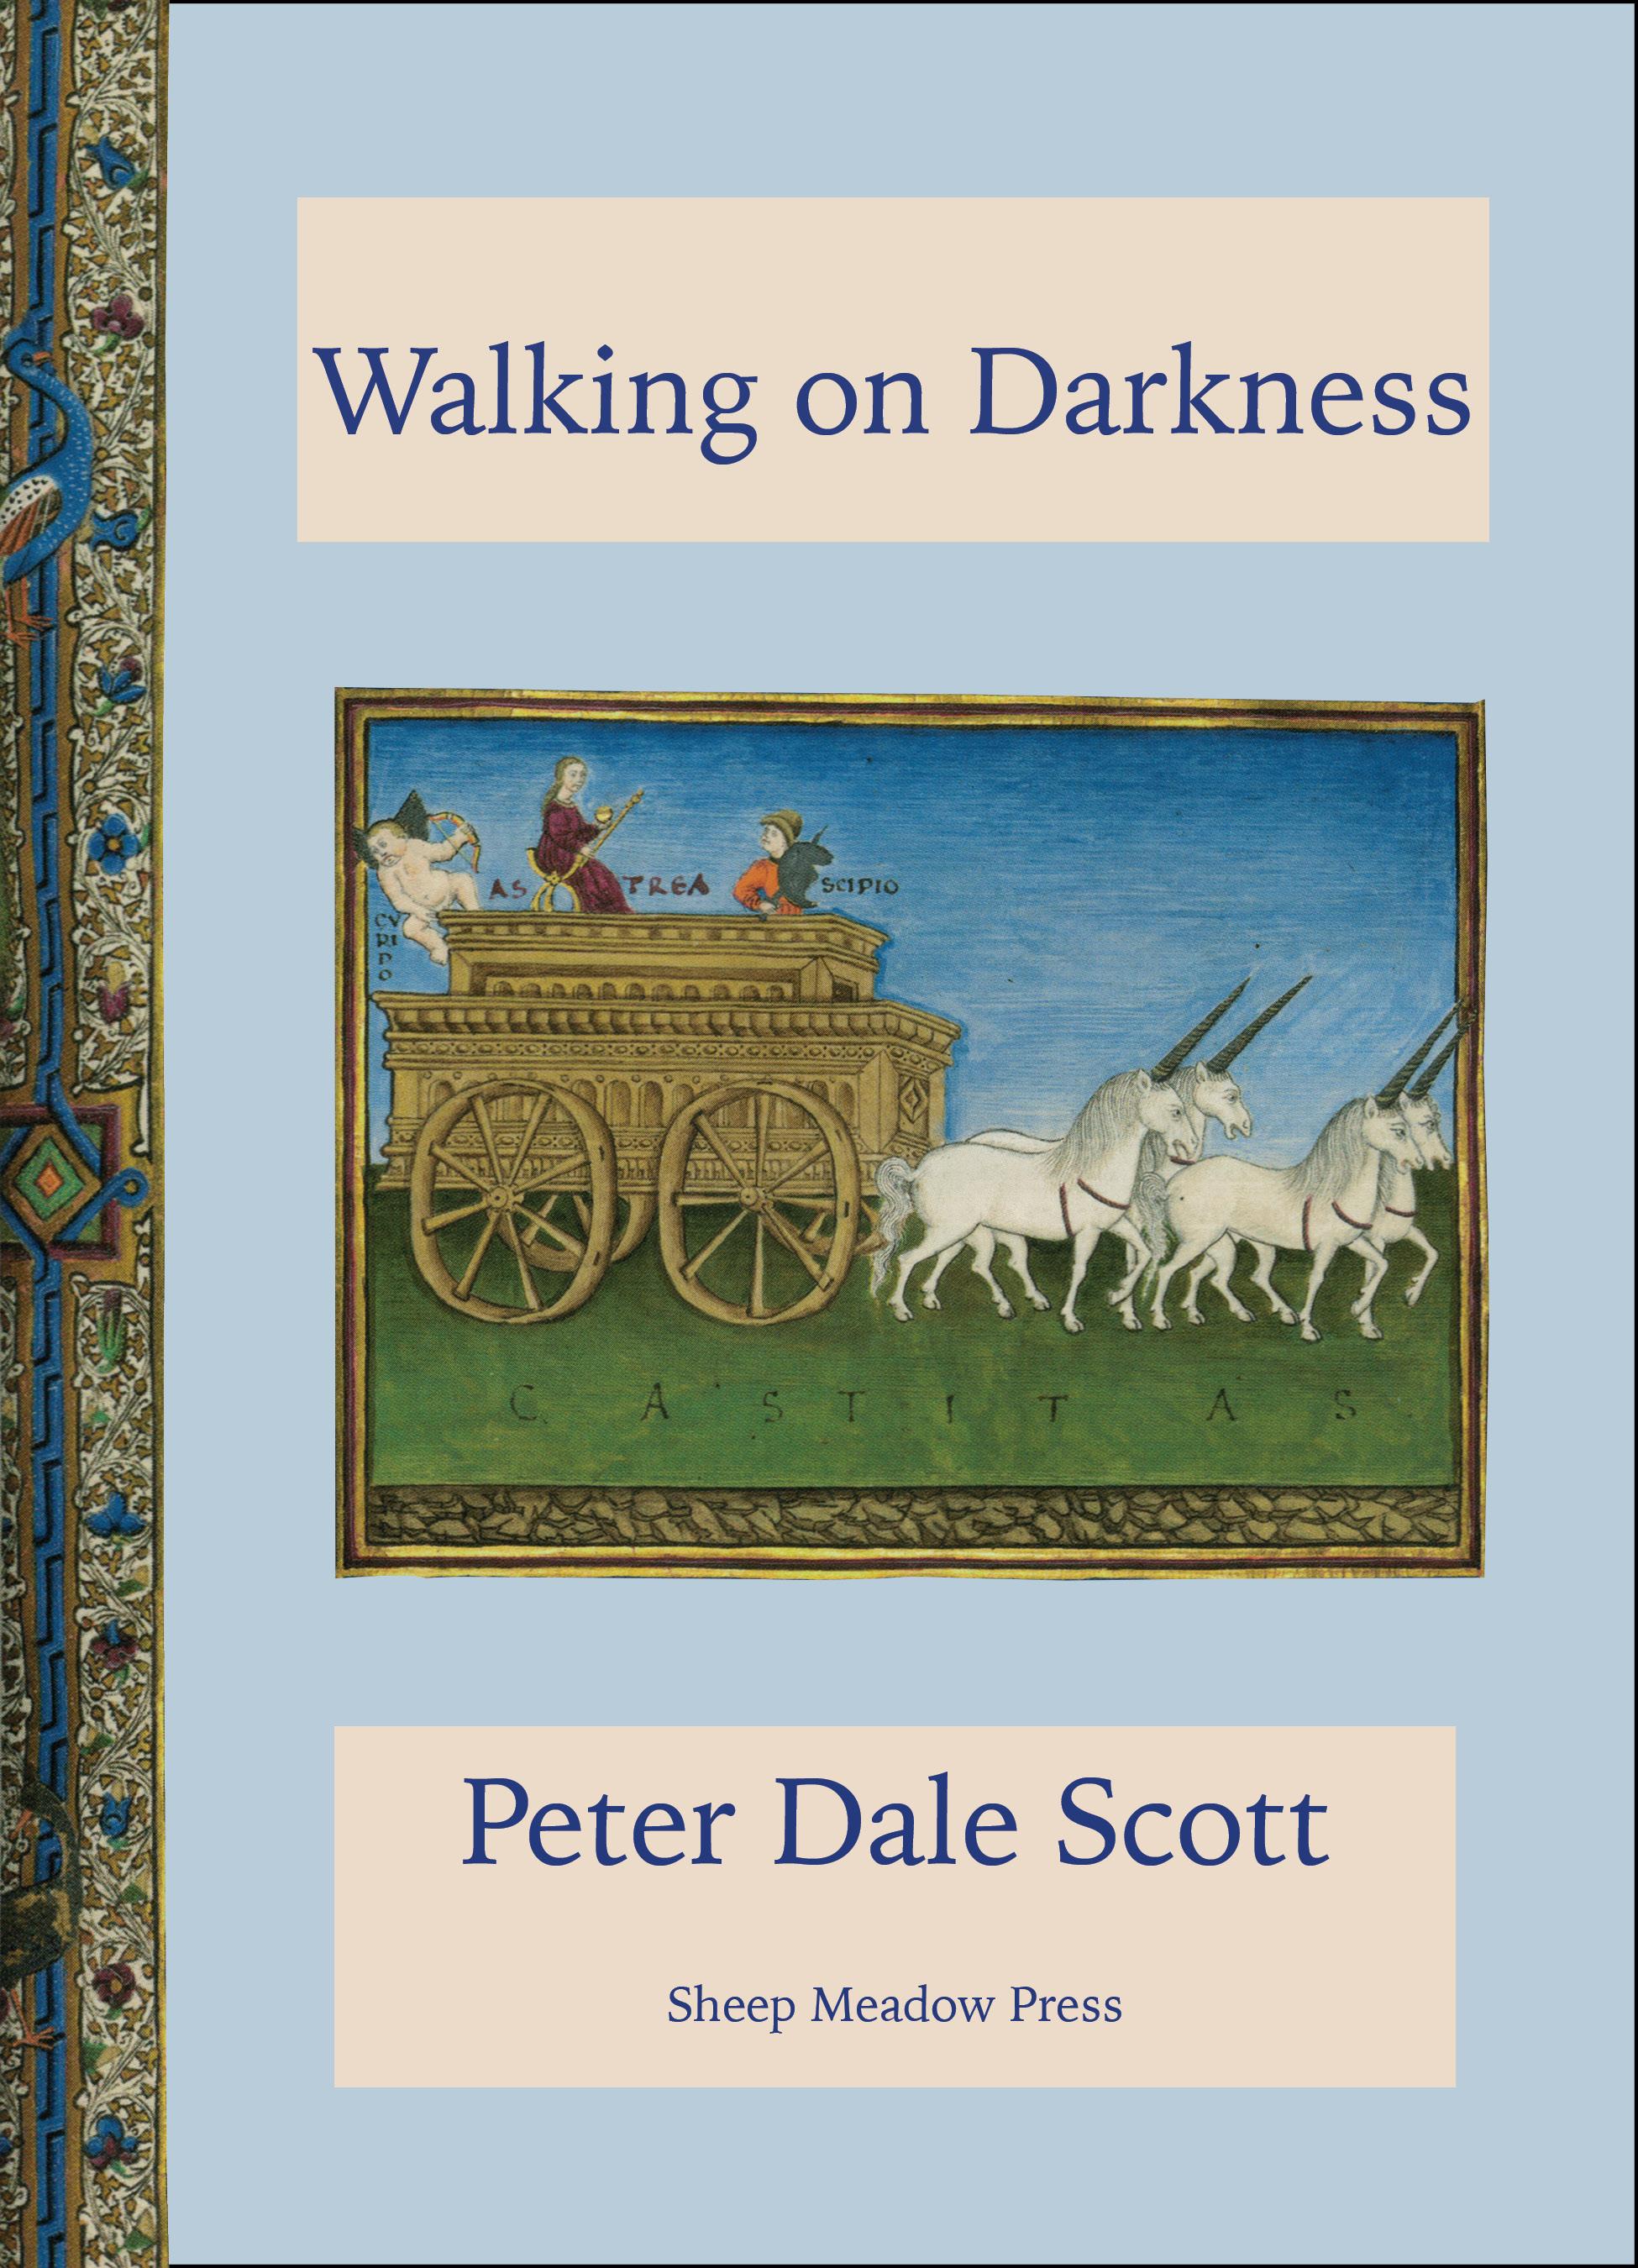 Peter Dale Scott Cover.jpg